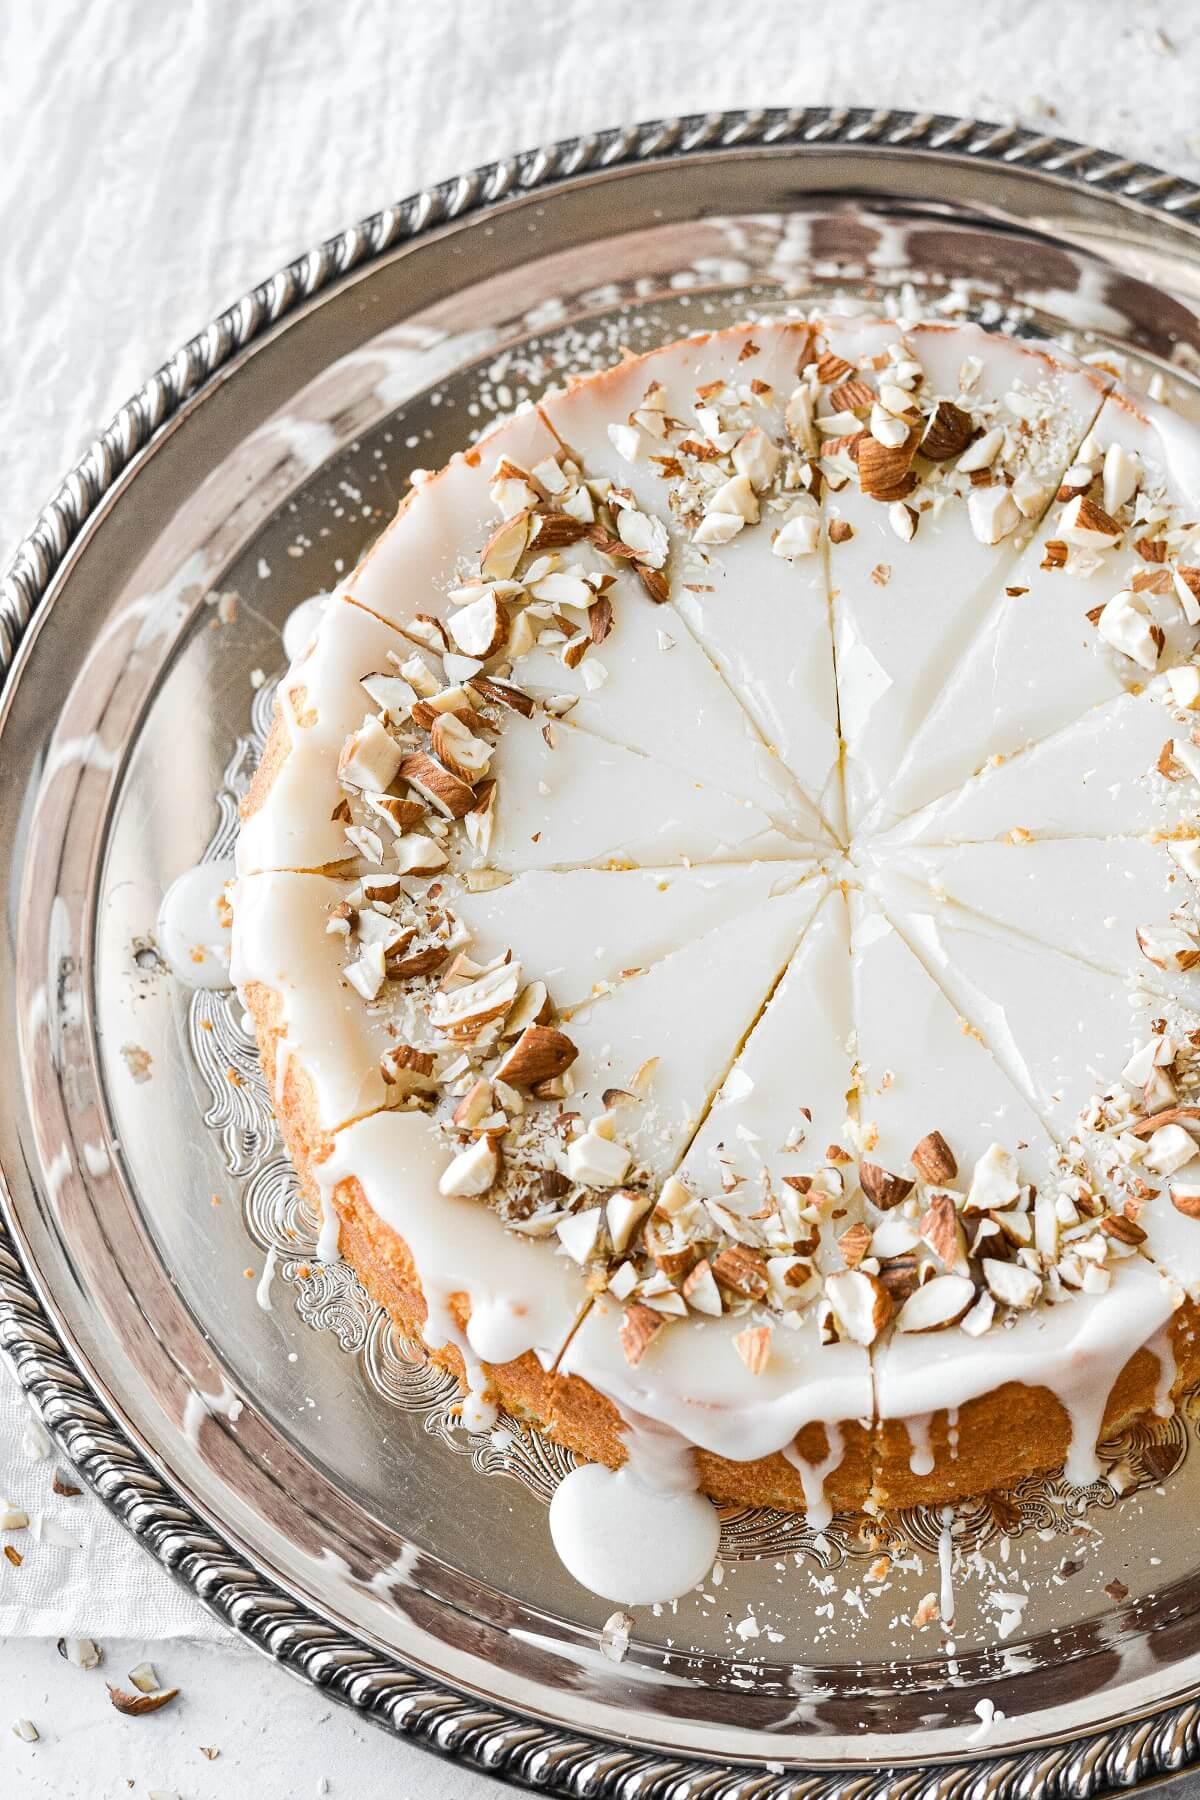 Flourless almond torte, cut into slices.